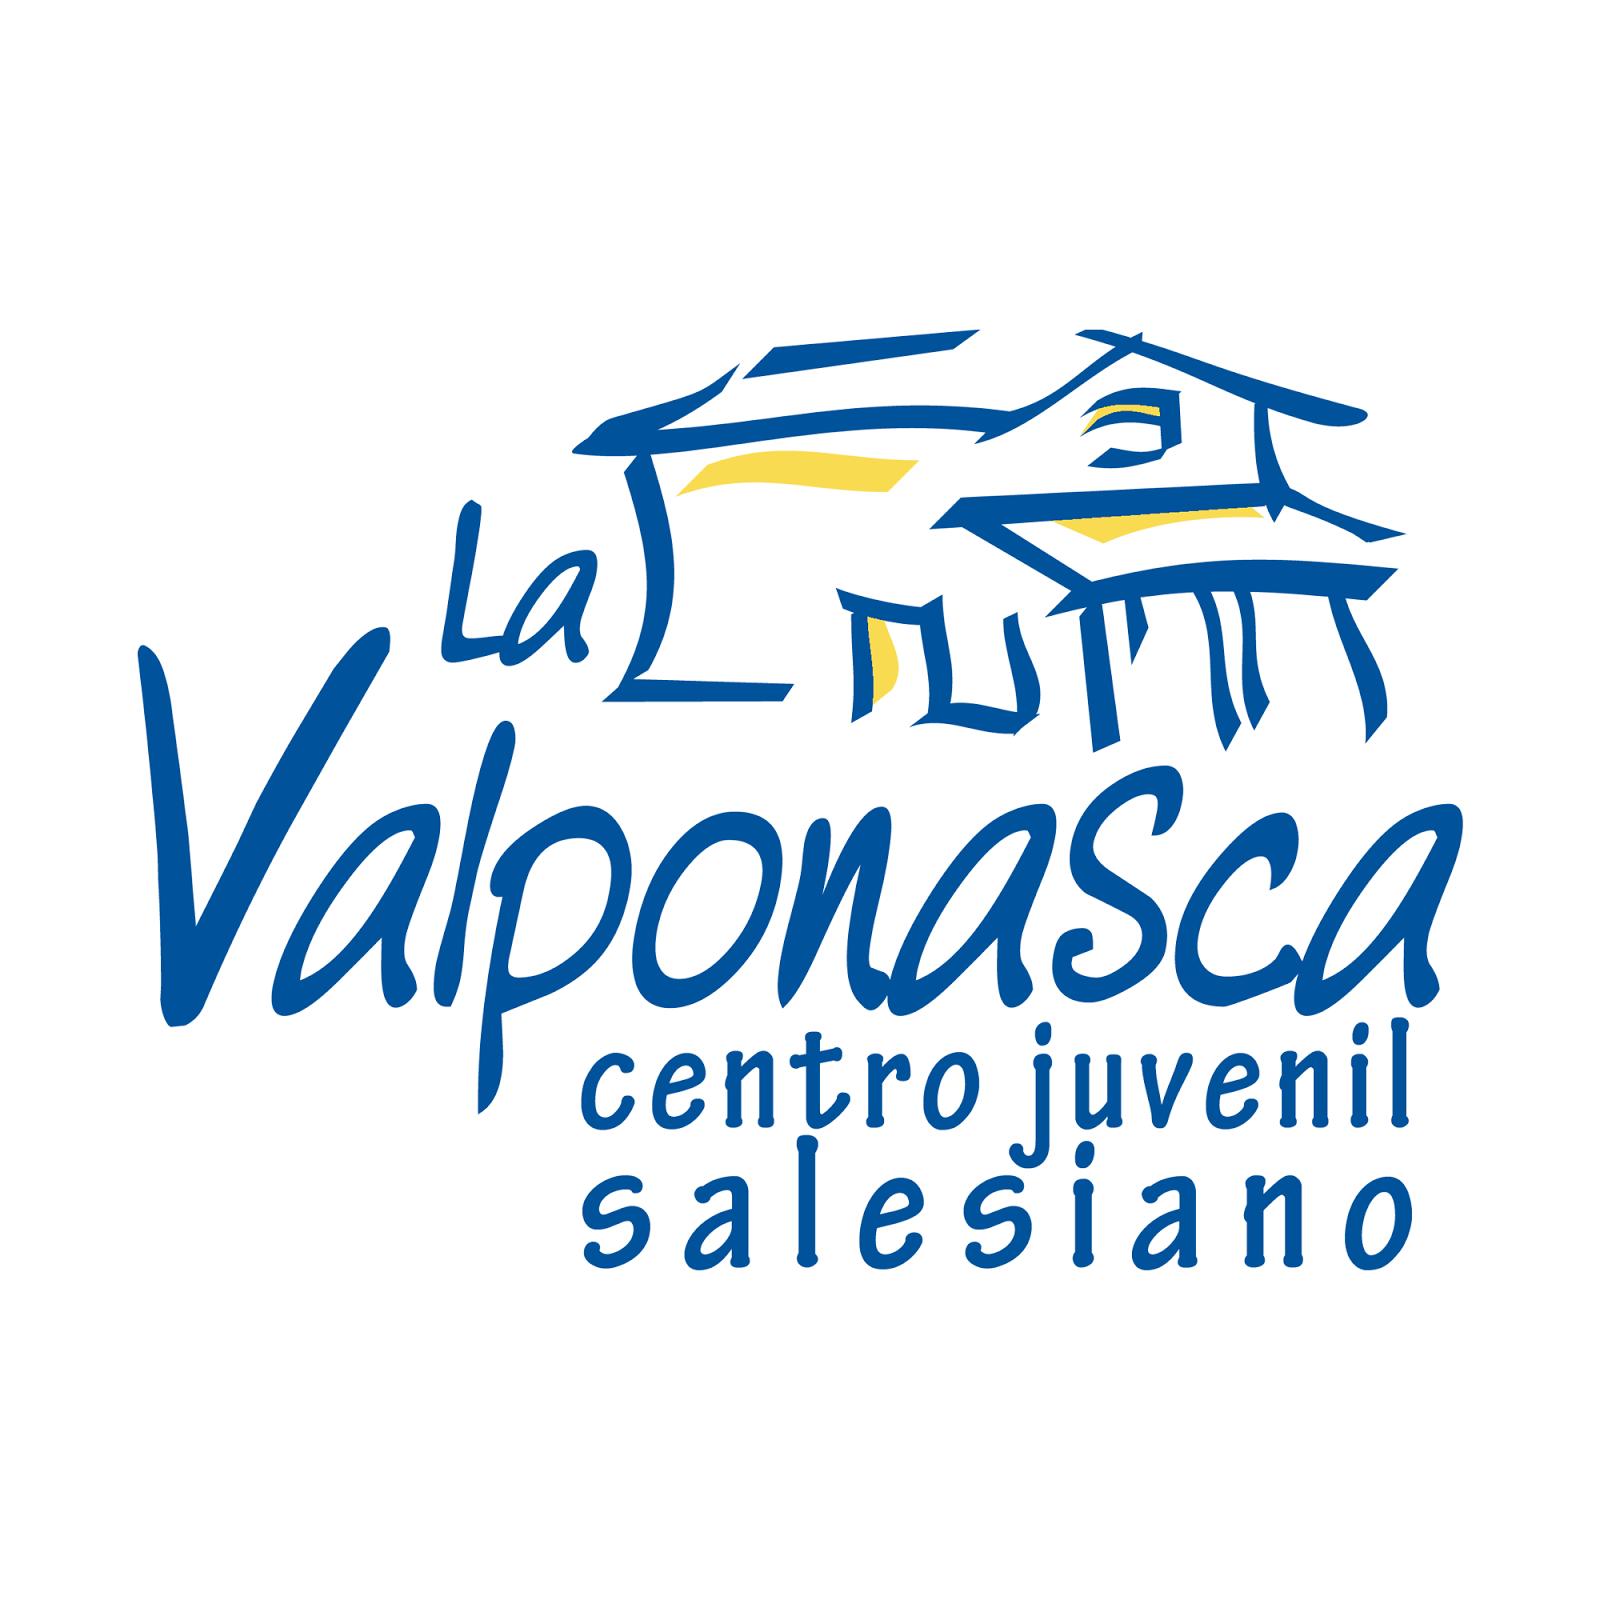 La Valponasca